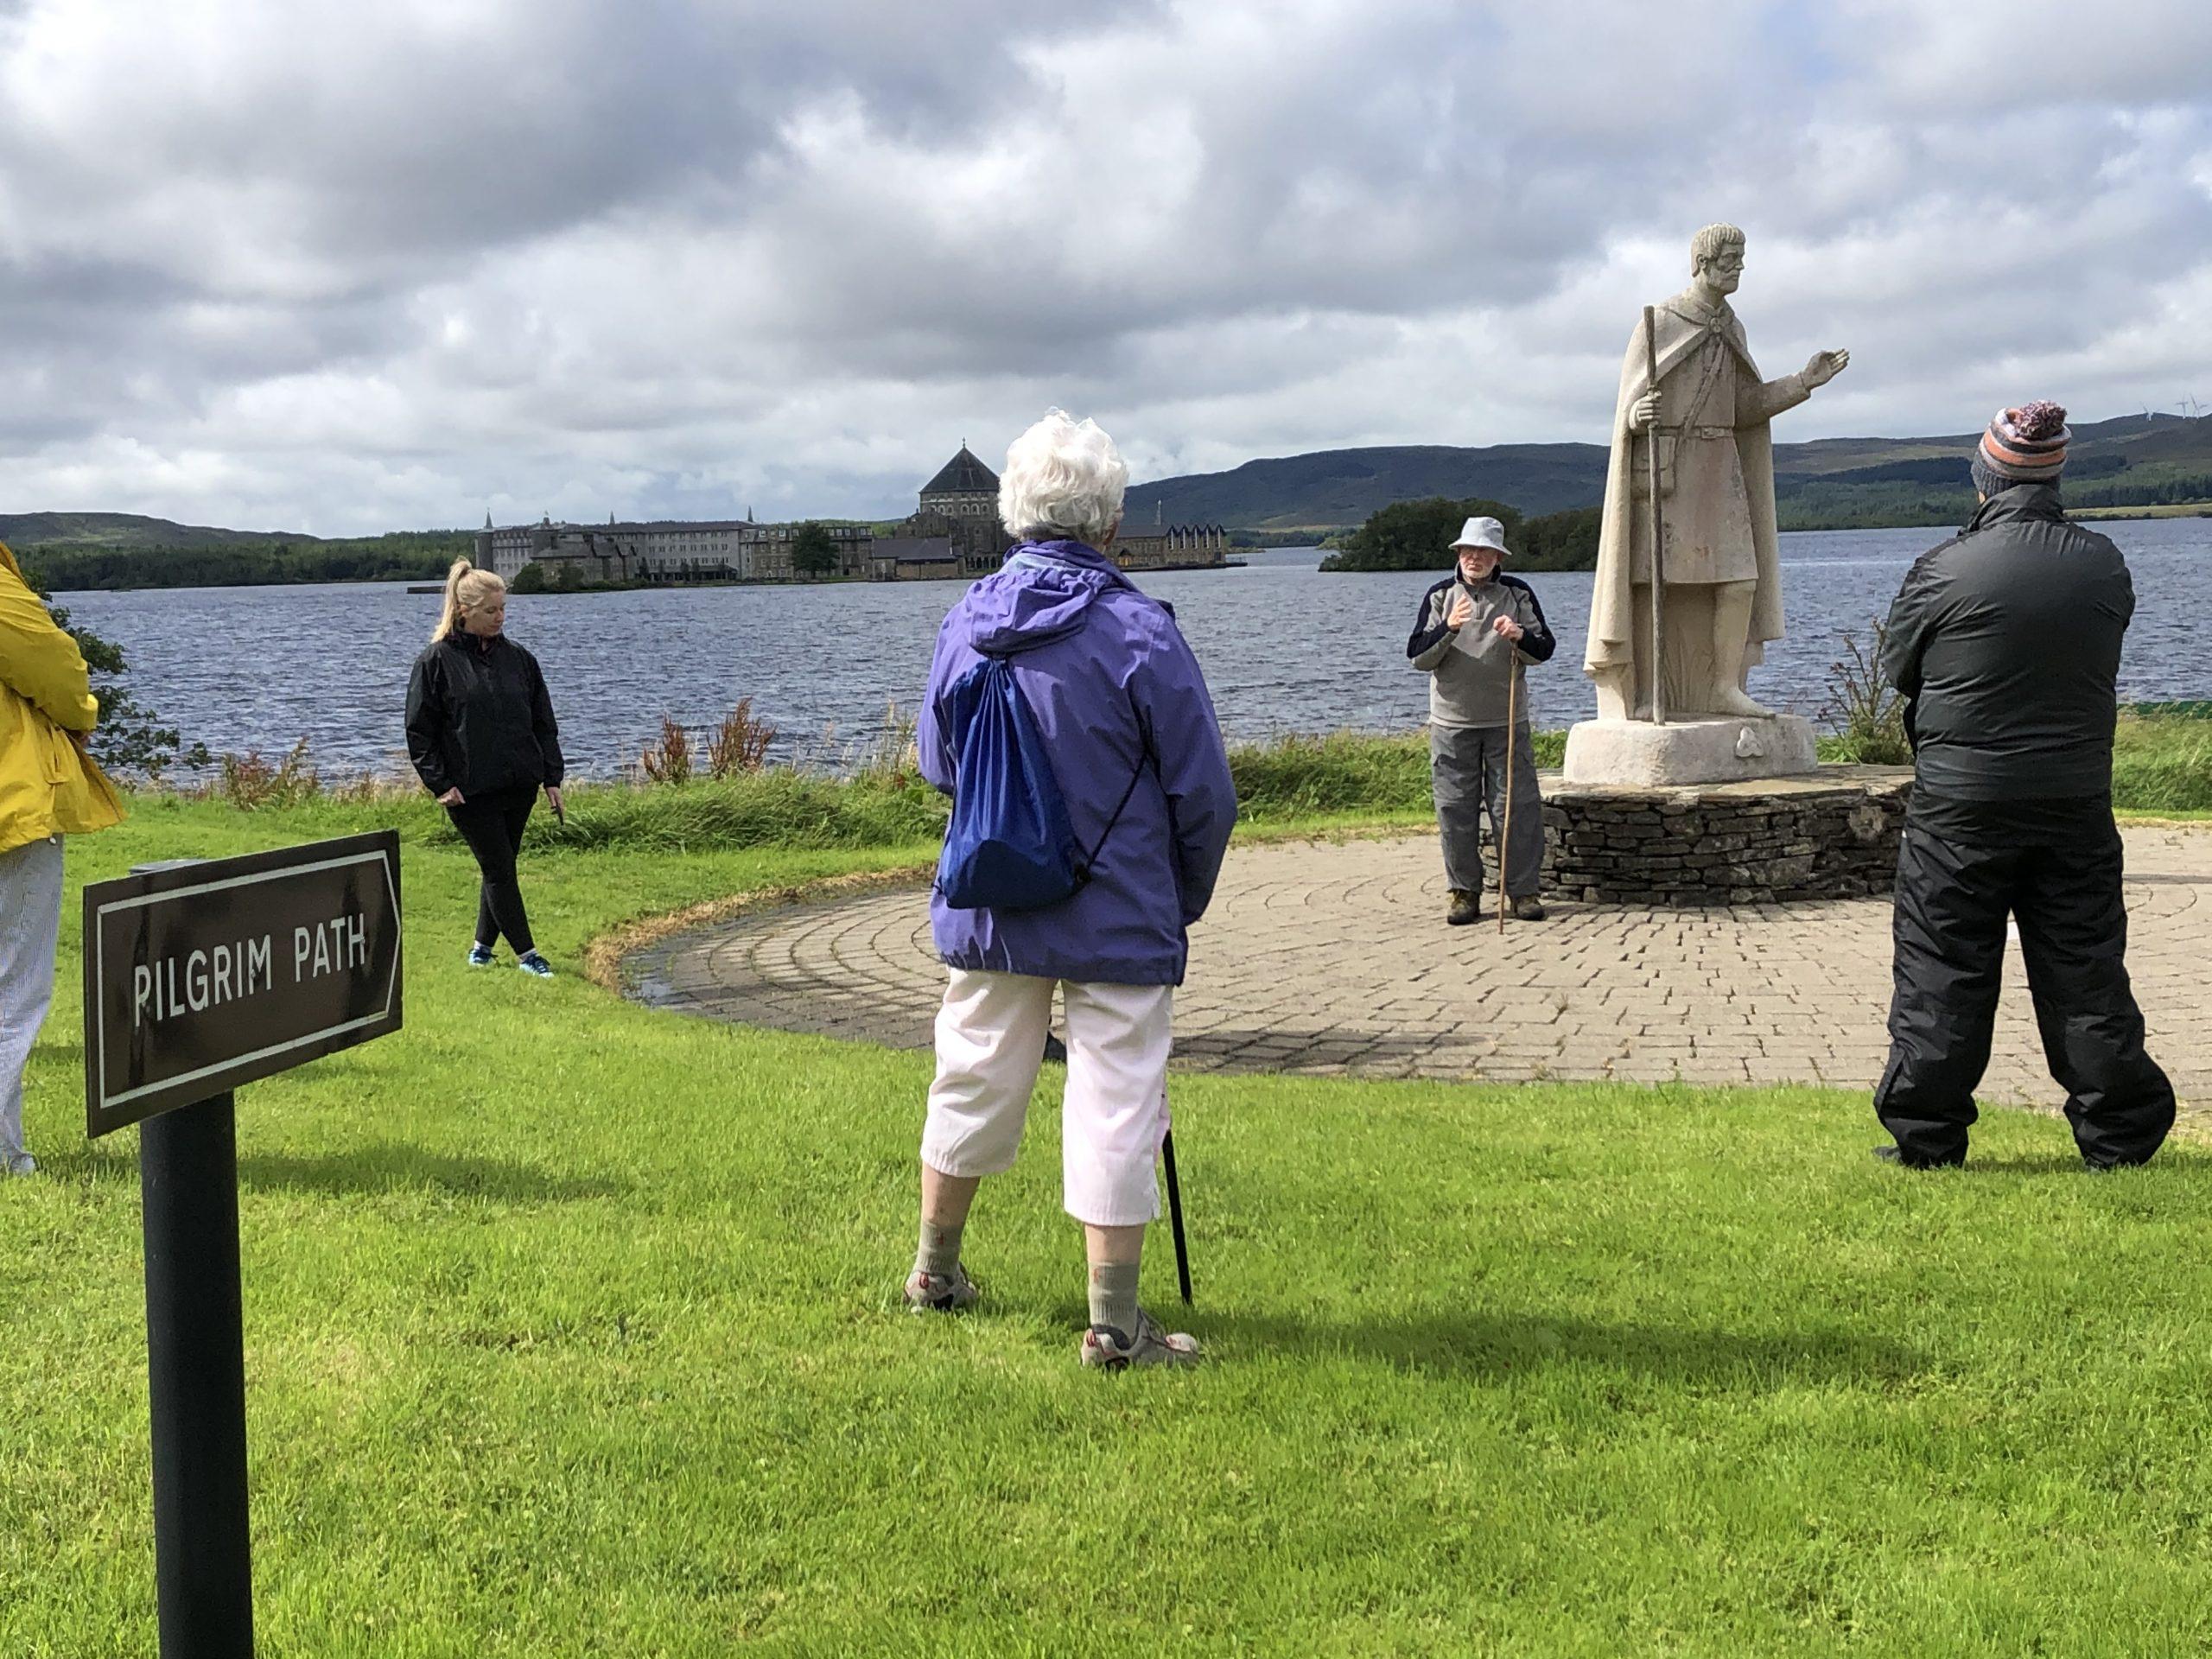 Lakeshore Pilgrimage Pilgrim Path Walk 2021